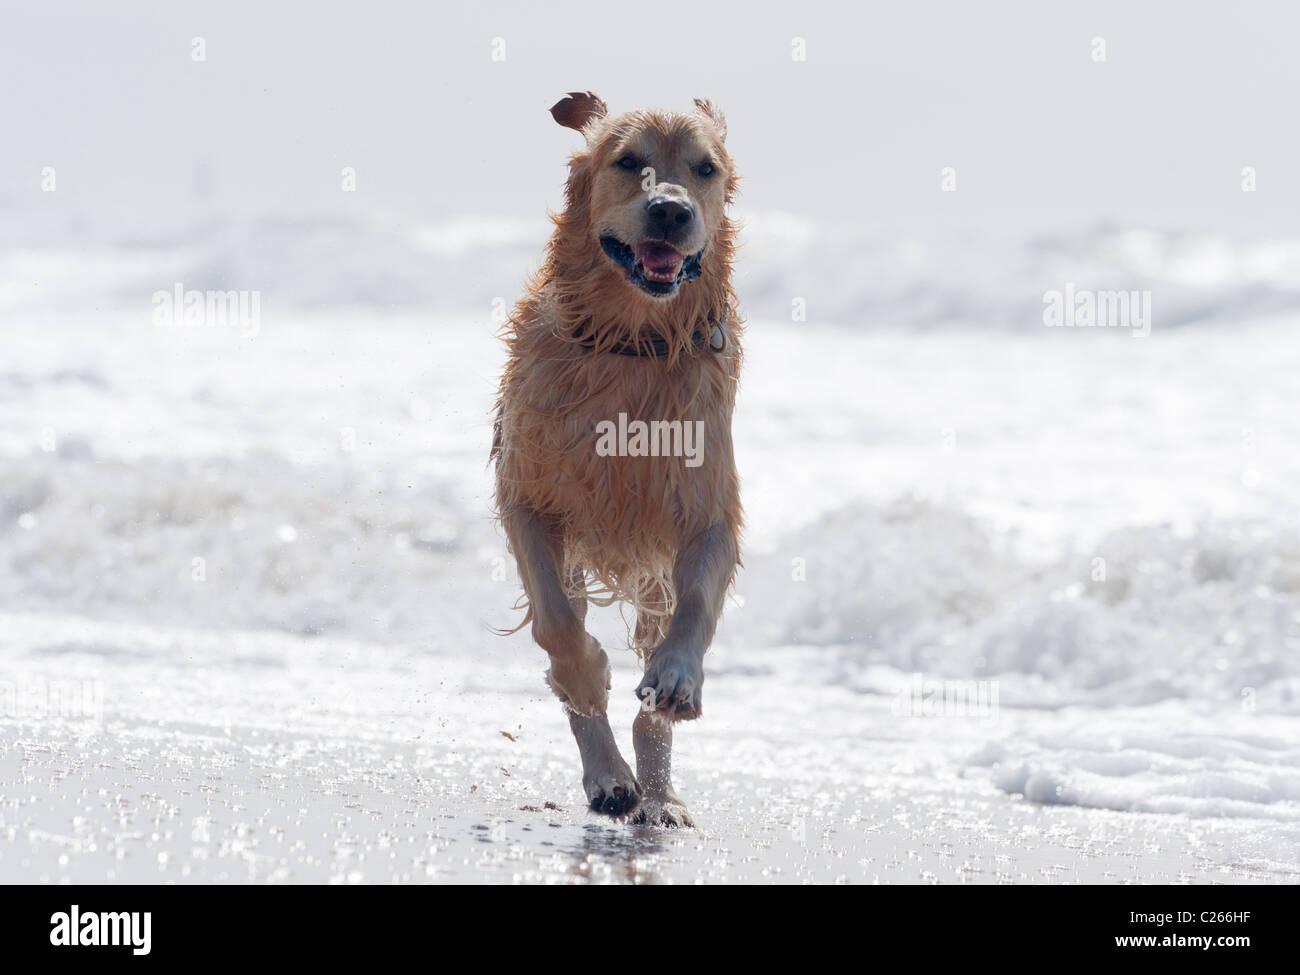 Golden retriever running at the beach. - Stock Image